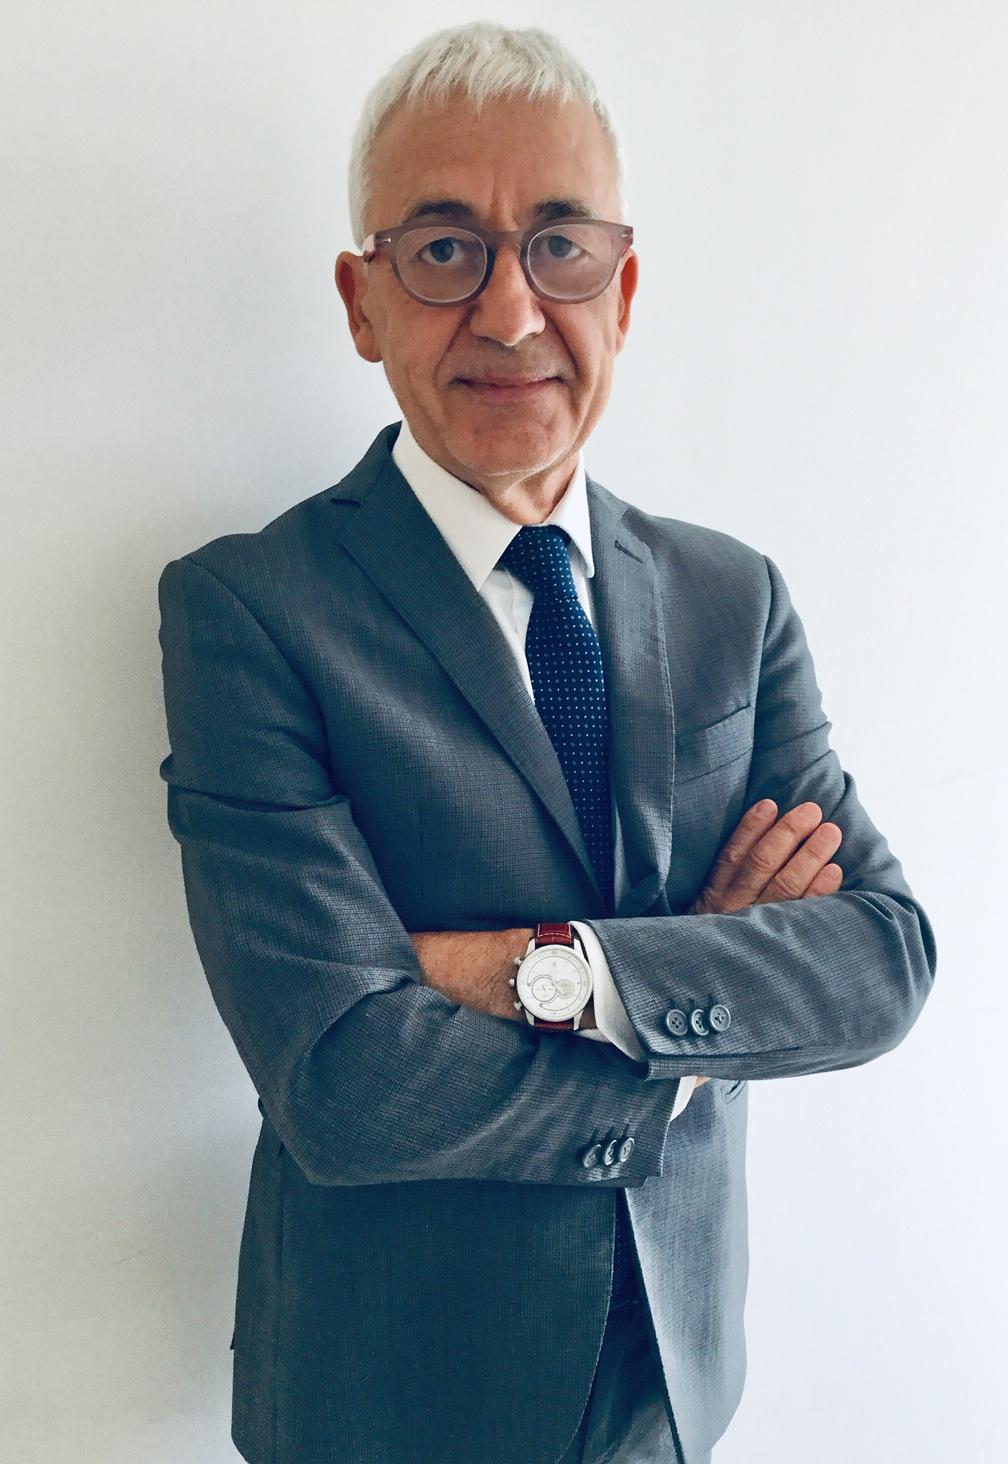 Valdemiro Chierchiè